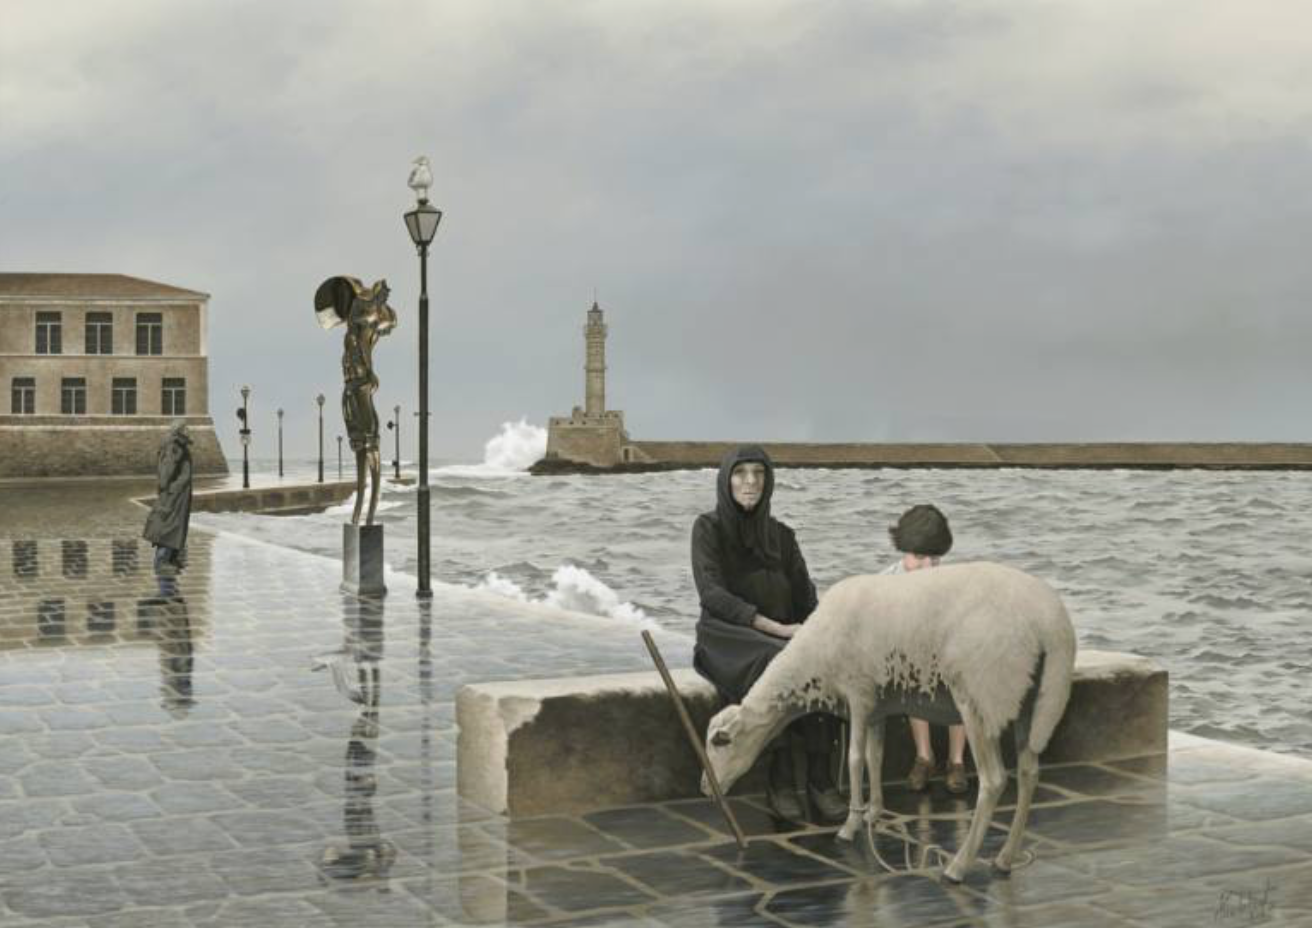 THE SENTINEL by Robert Vanderhorst